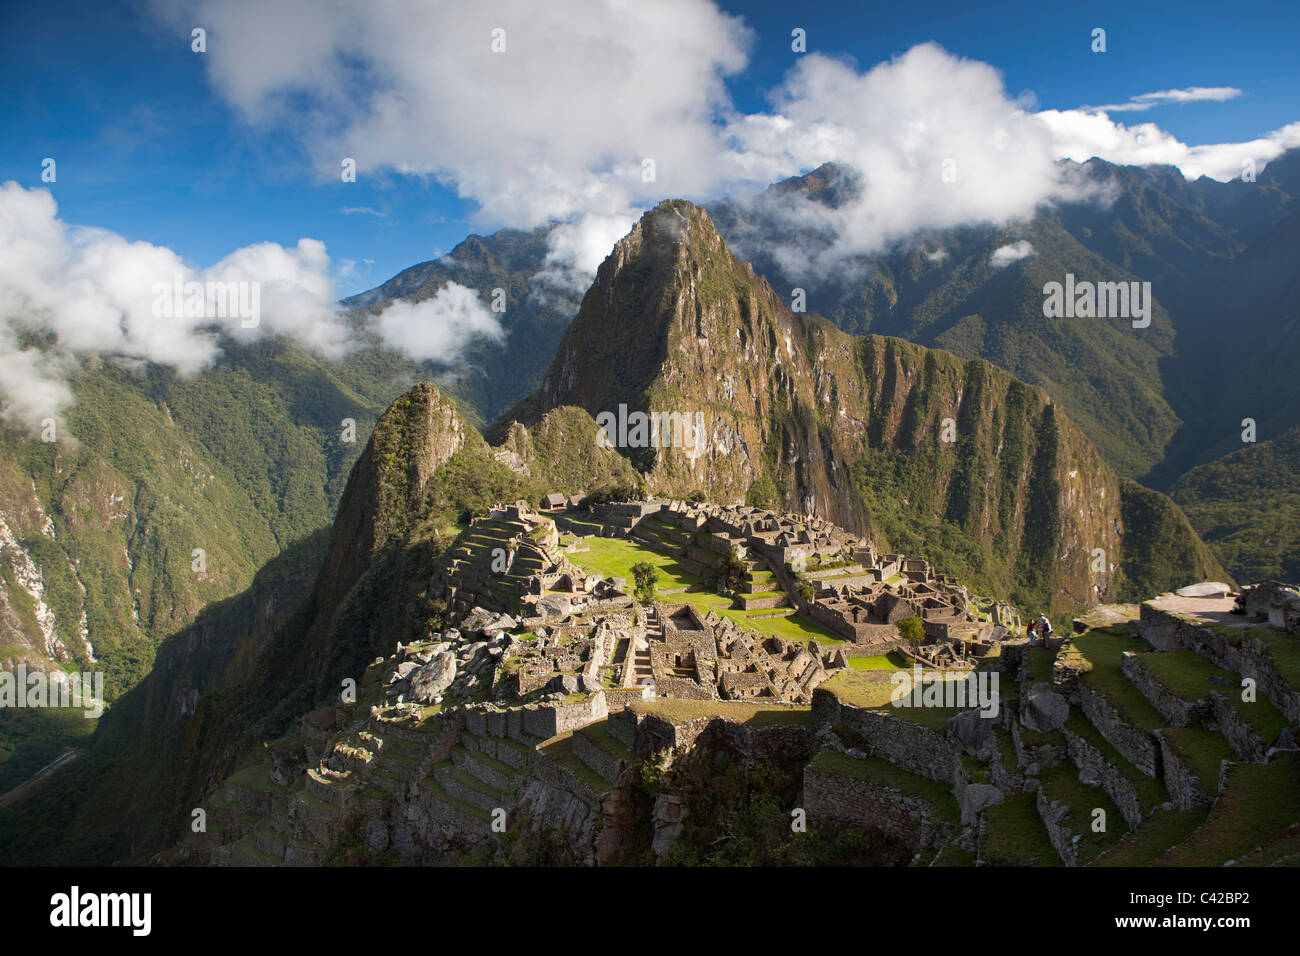 Peru, 15th-century Inca site located 2,430 metres (7,970 ft) above sea level. - Stock Image